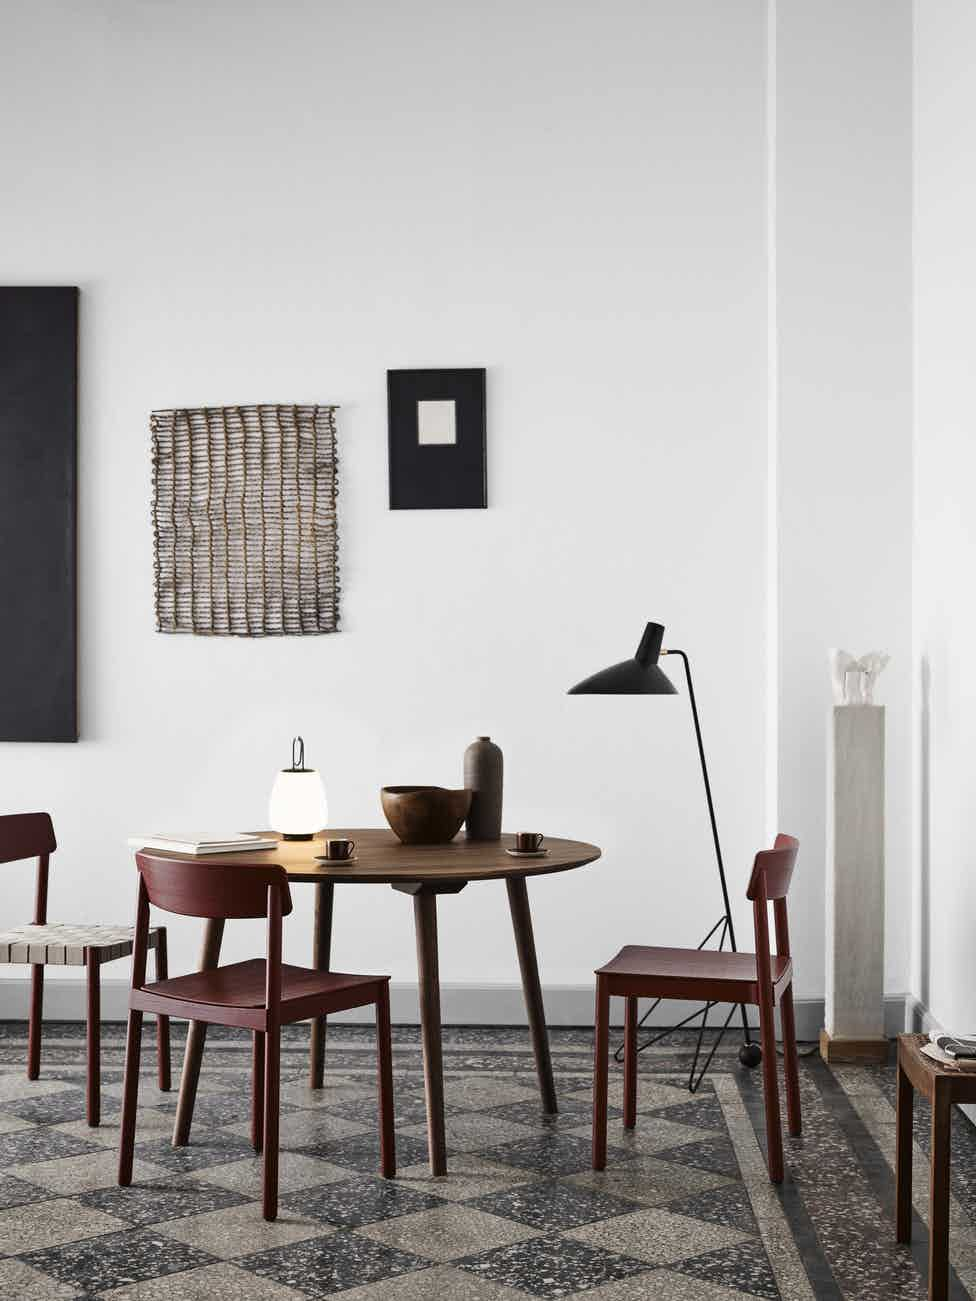 Andtradition tripod hm8 floor lamp black dining insitu haute living